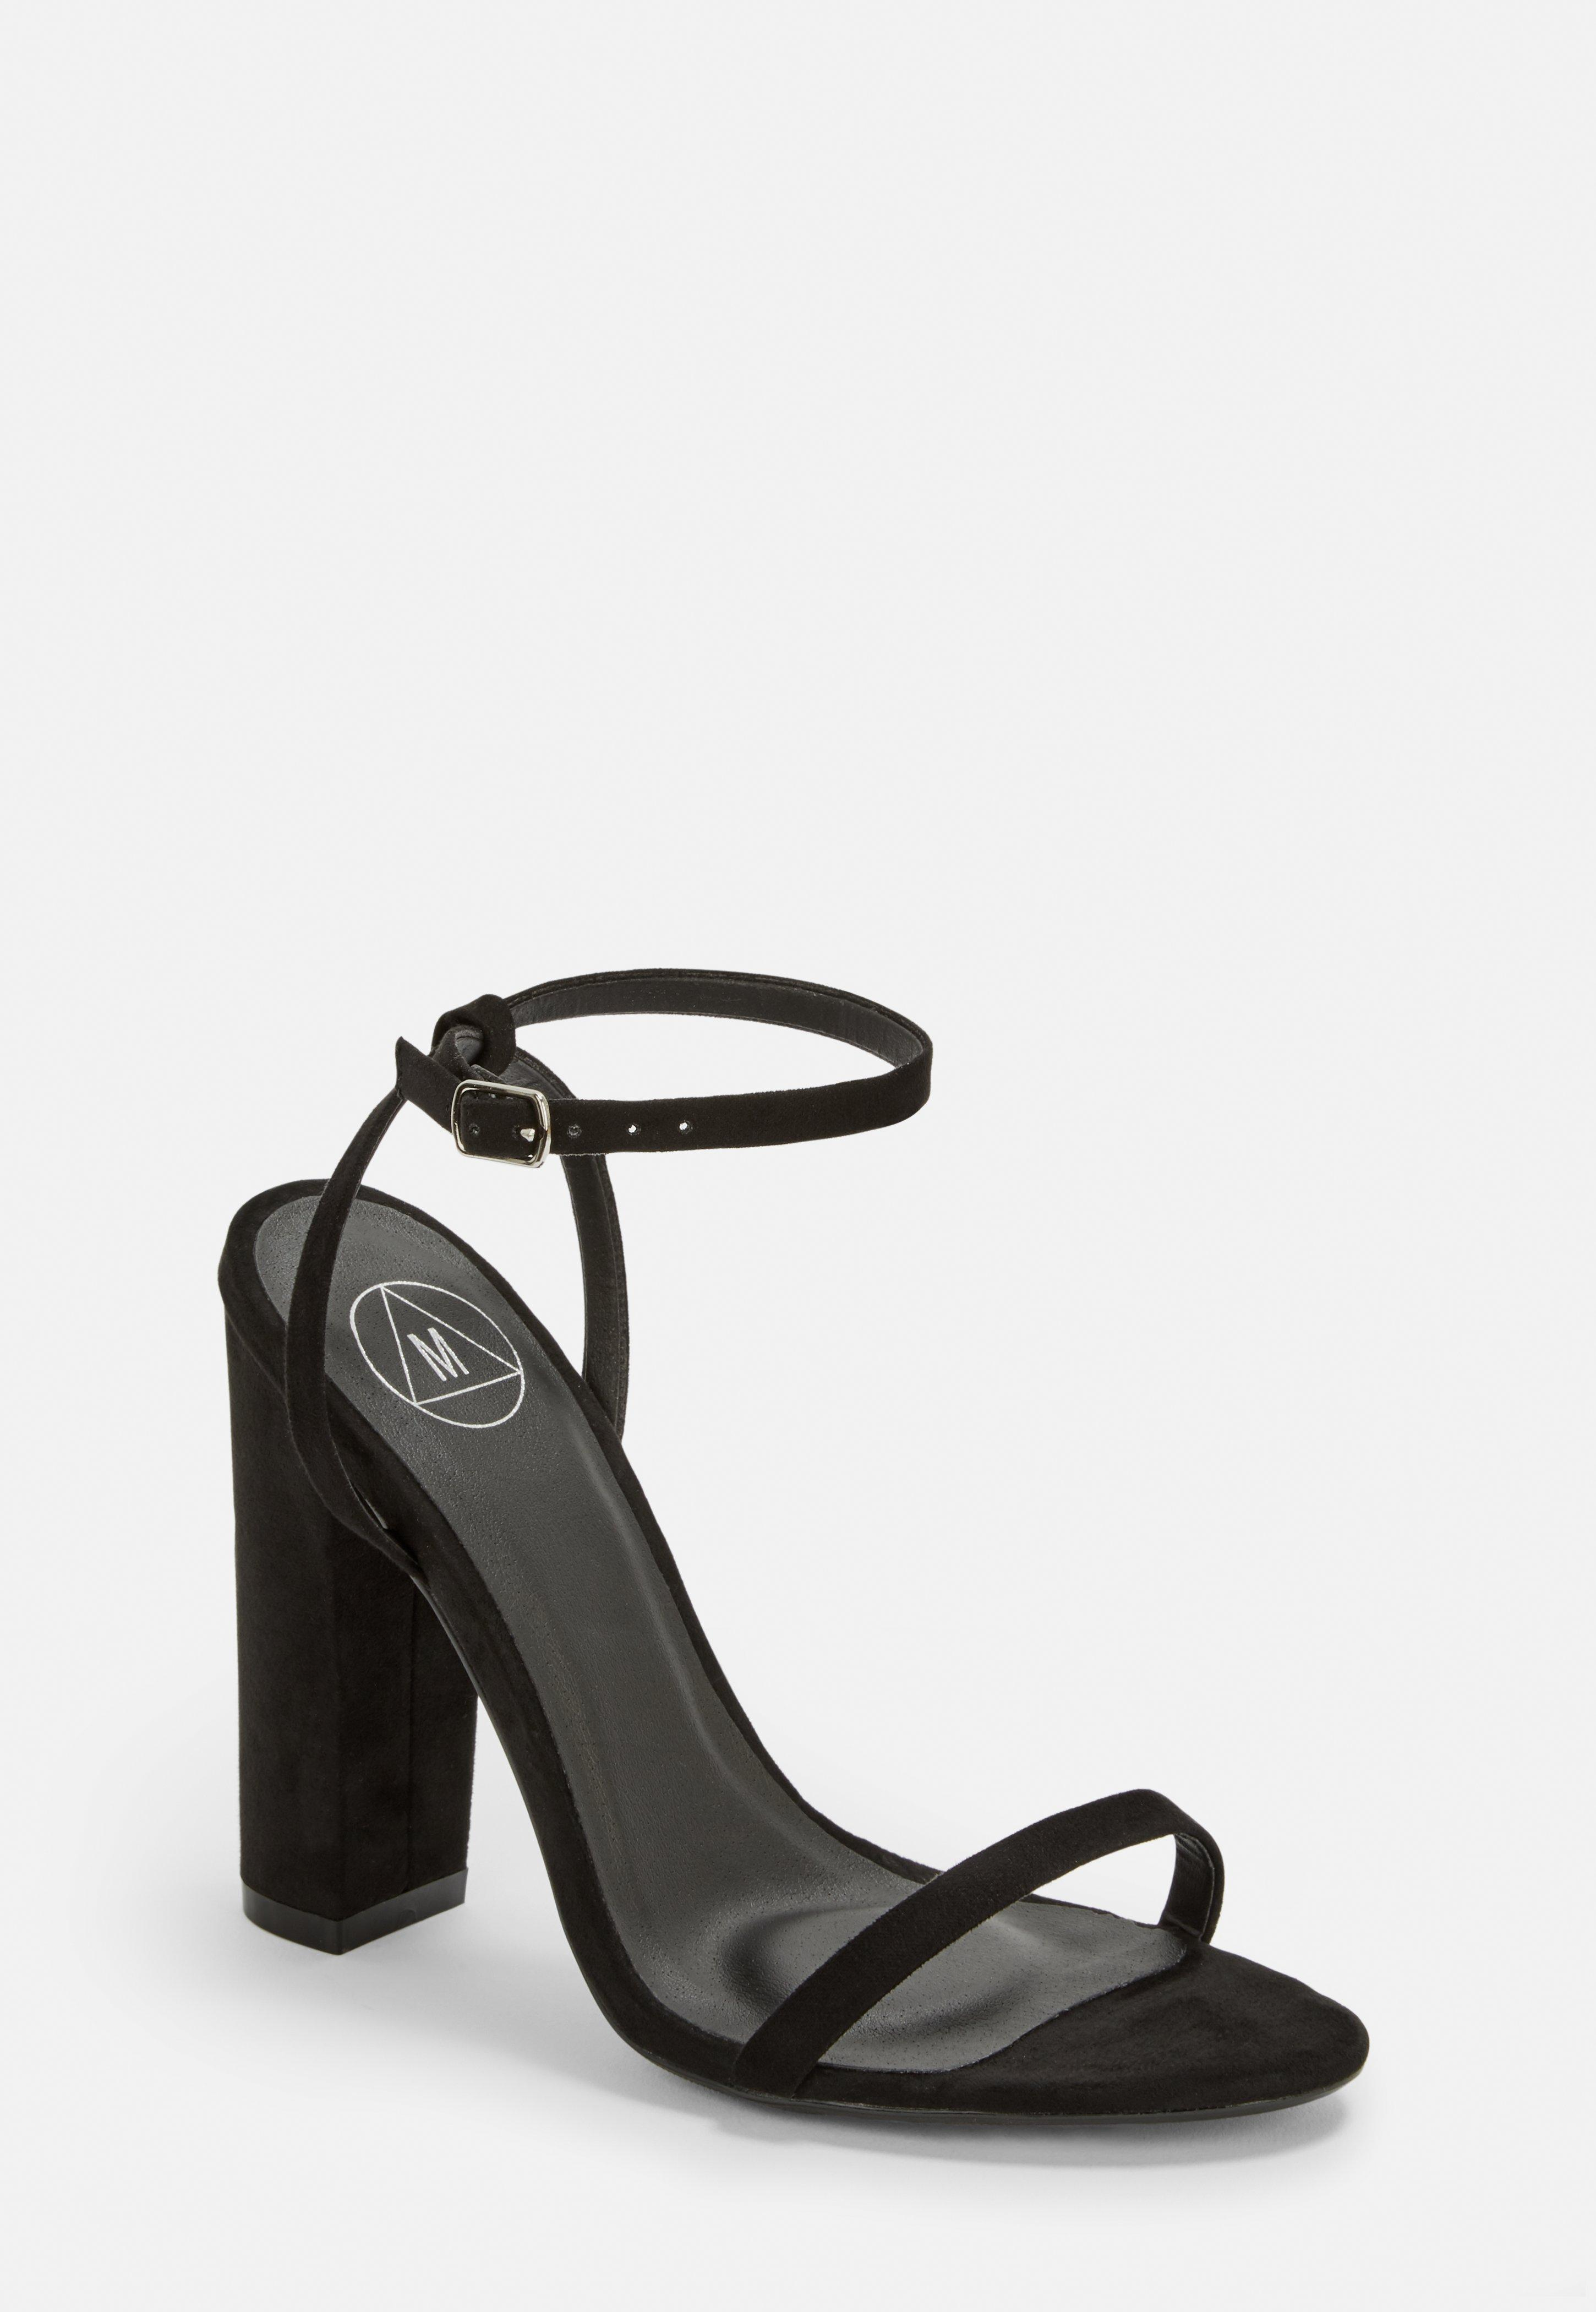 828275bdb75 Lyst - Missguided Black Faux Suede Heel Sandals in Black